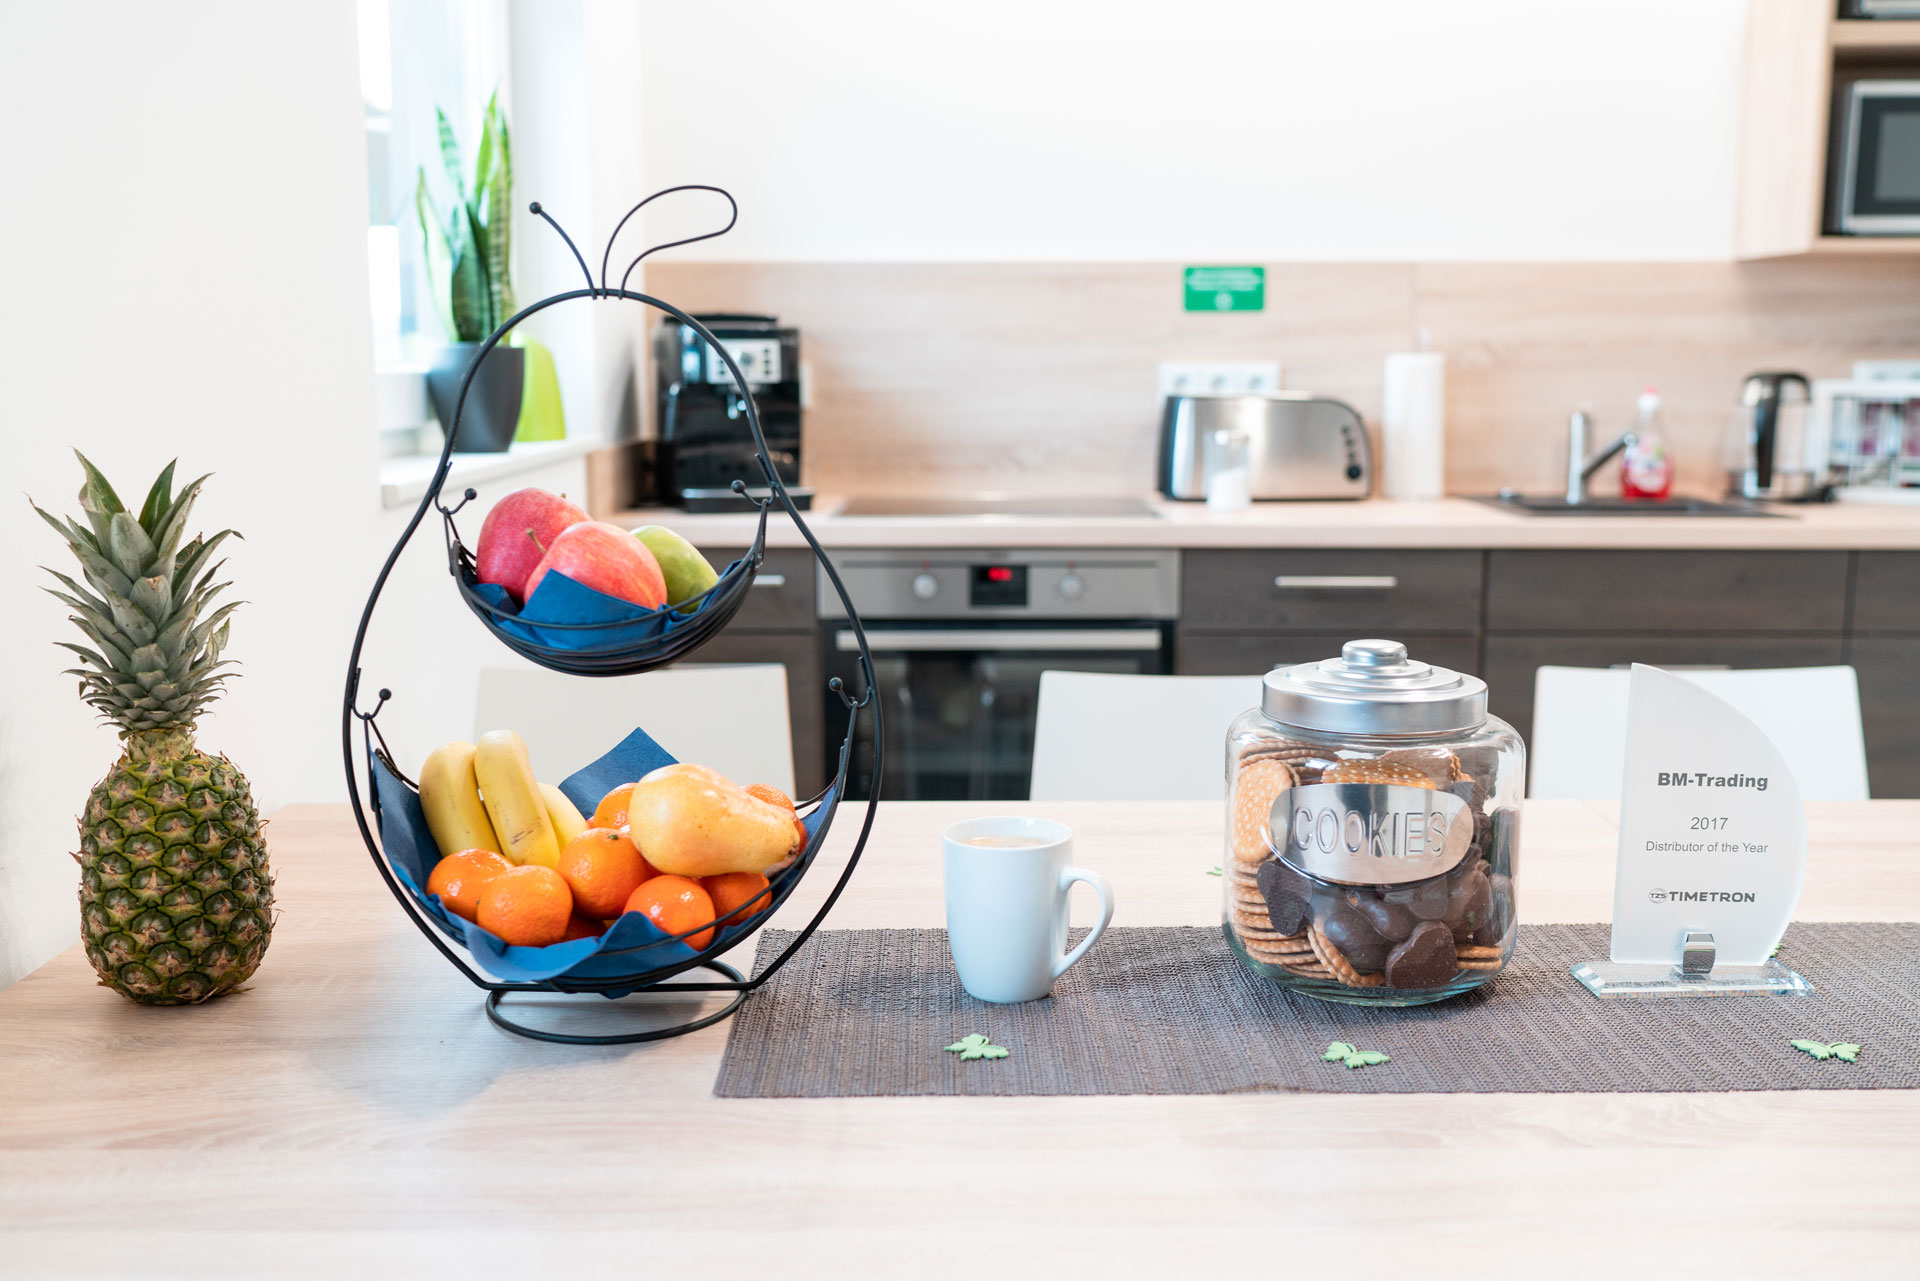 BM-Trading-Arbeitsplatz-Kaffee-Obst-Versorgung-kostenlos